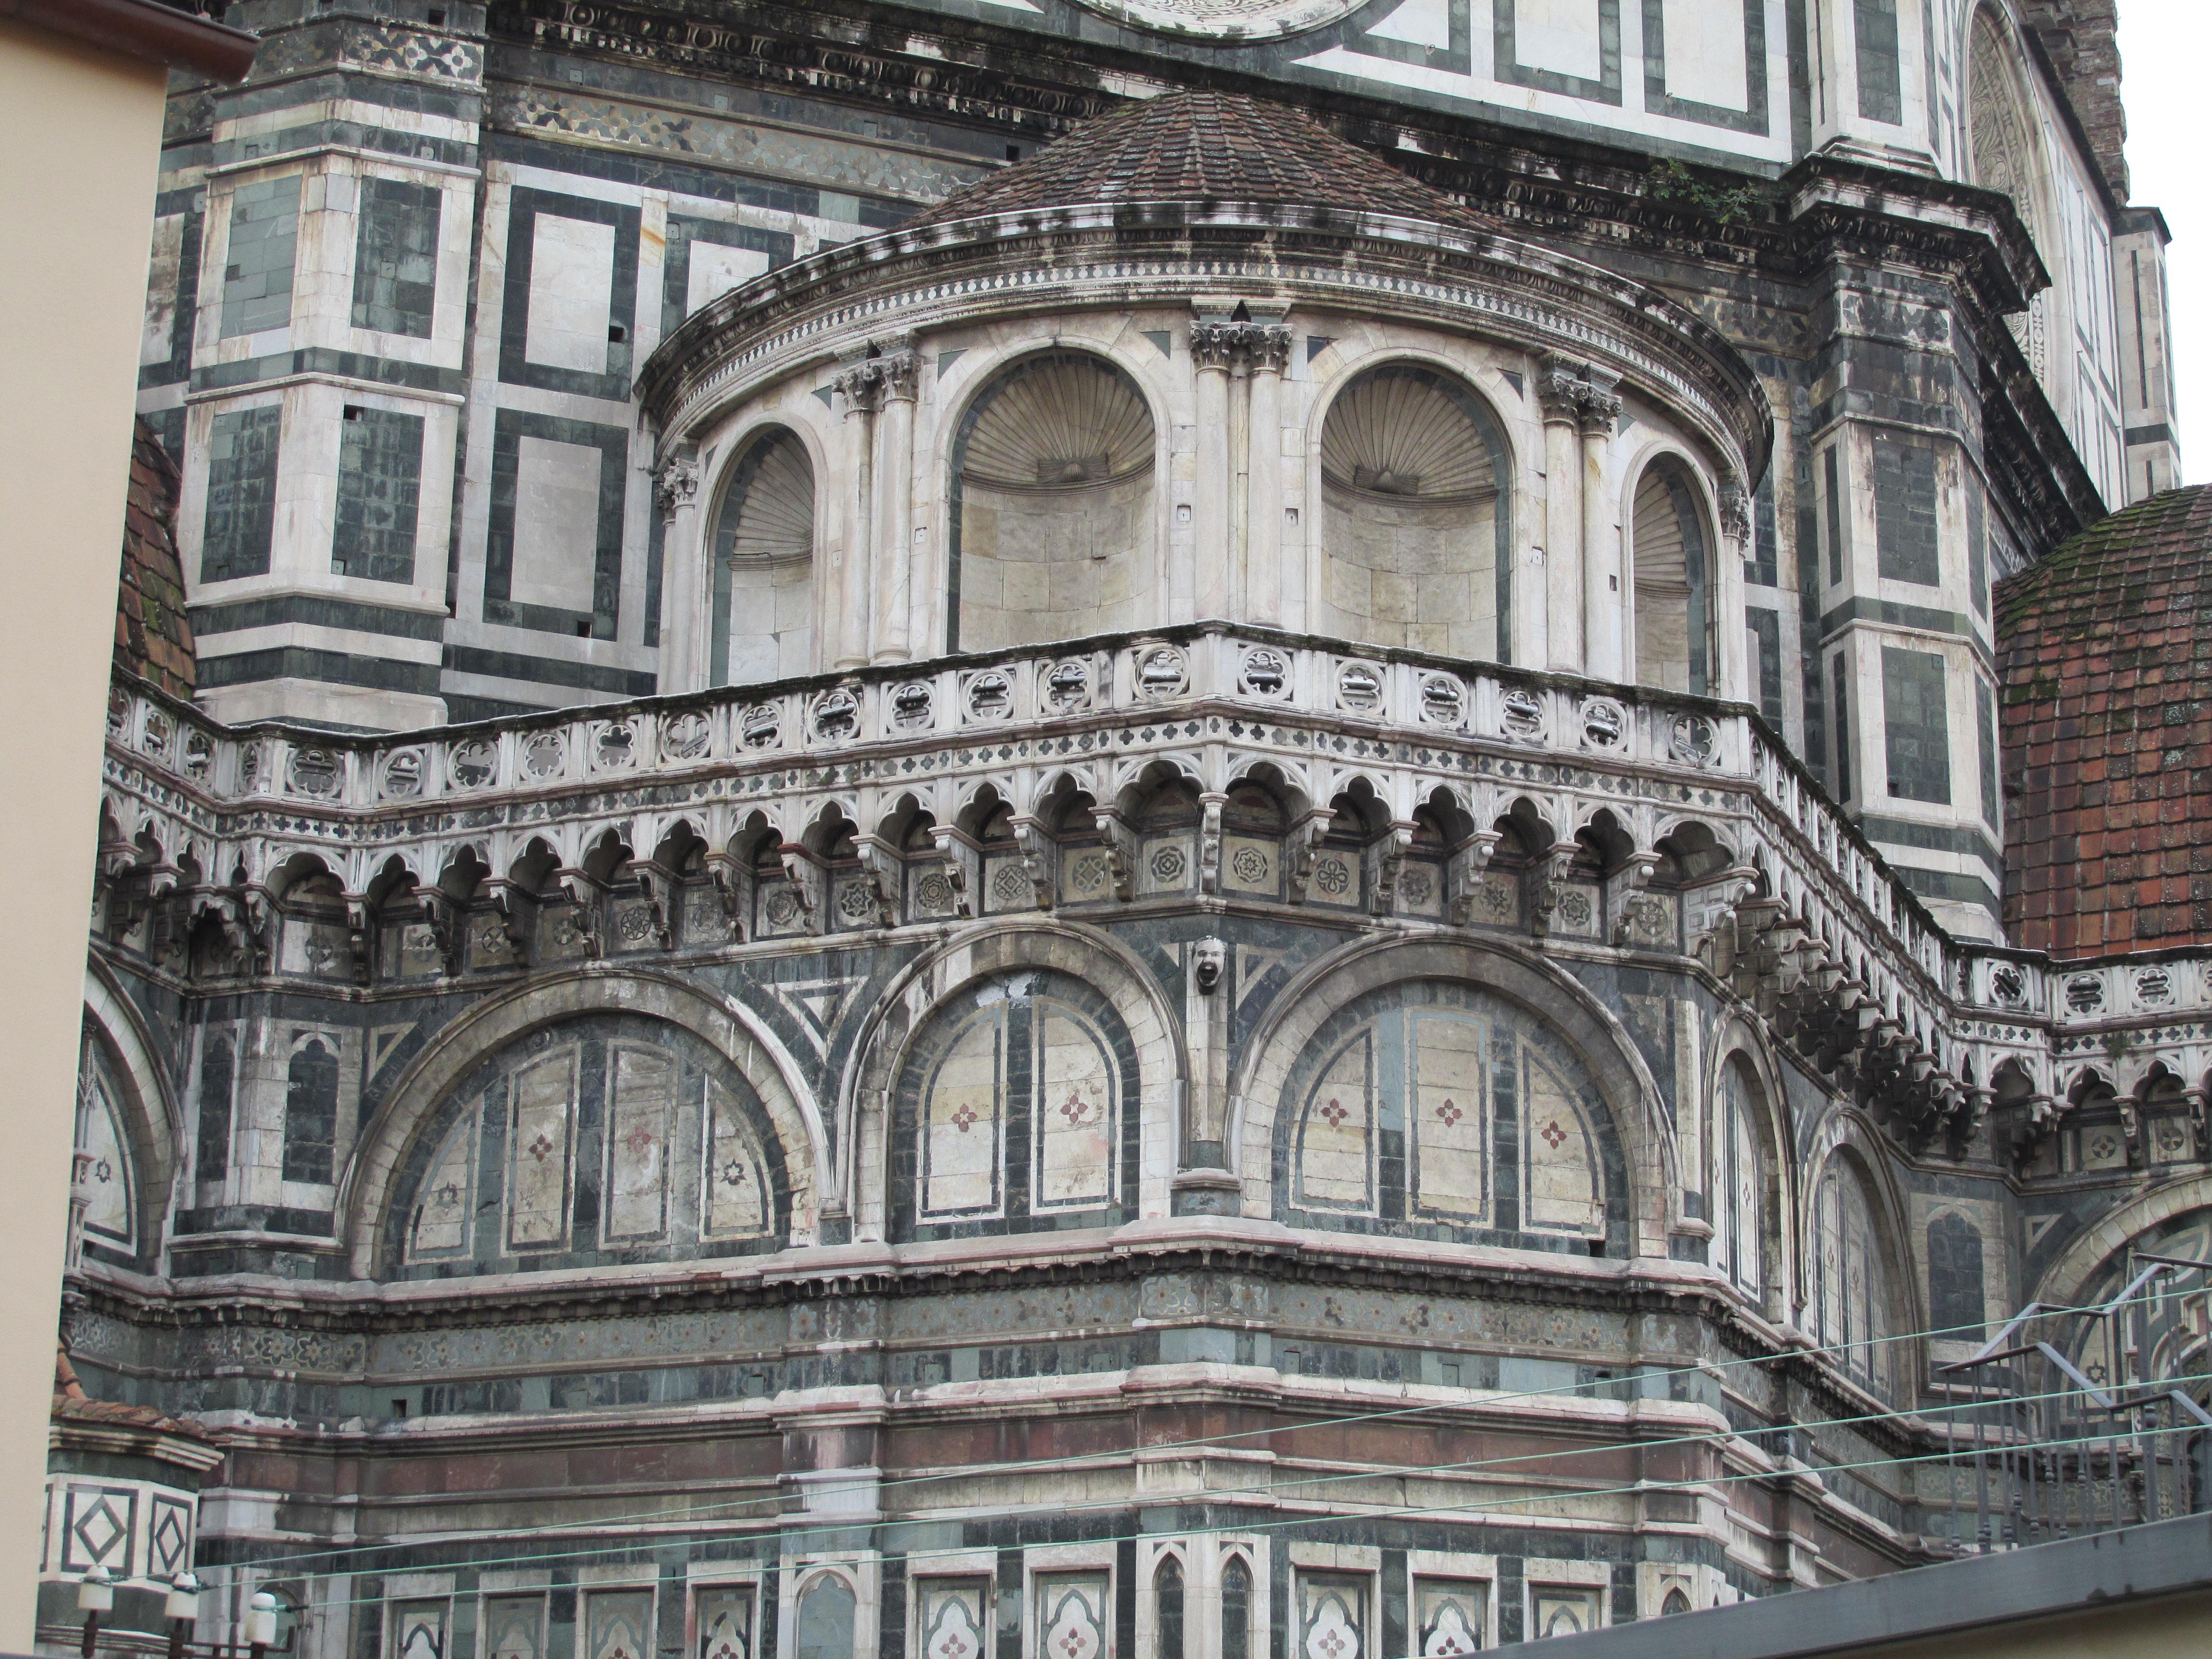 img 2842 - Visitando la Catedral Santa Maria del Fiore de Florencia I/III